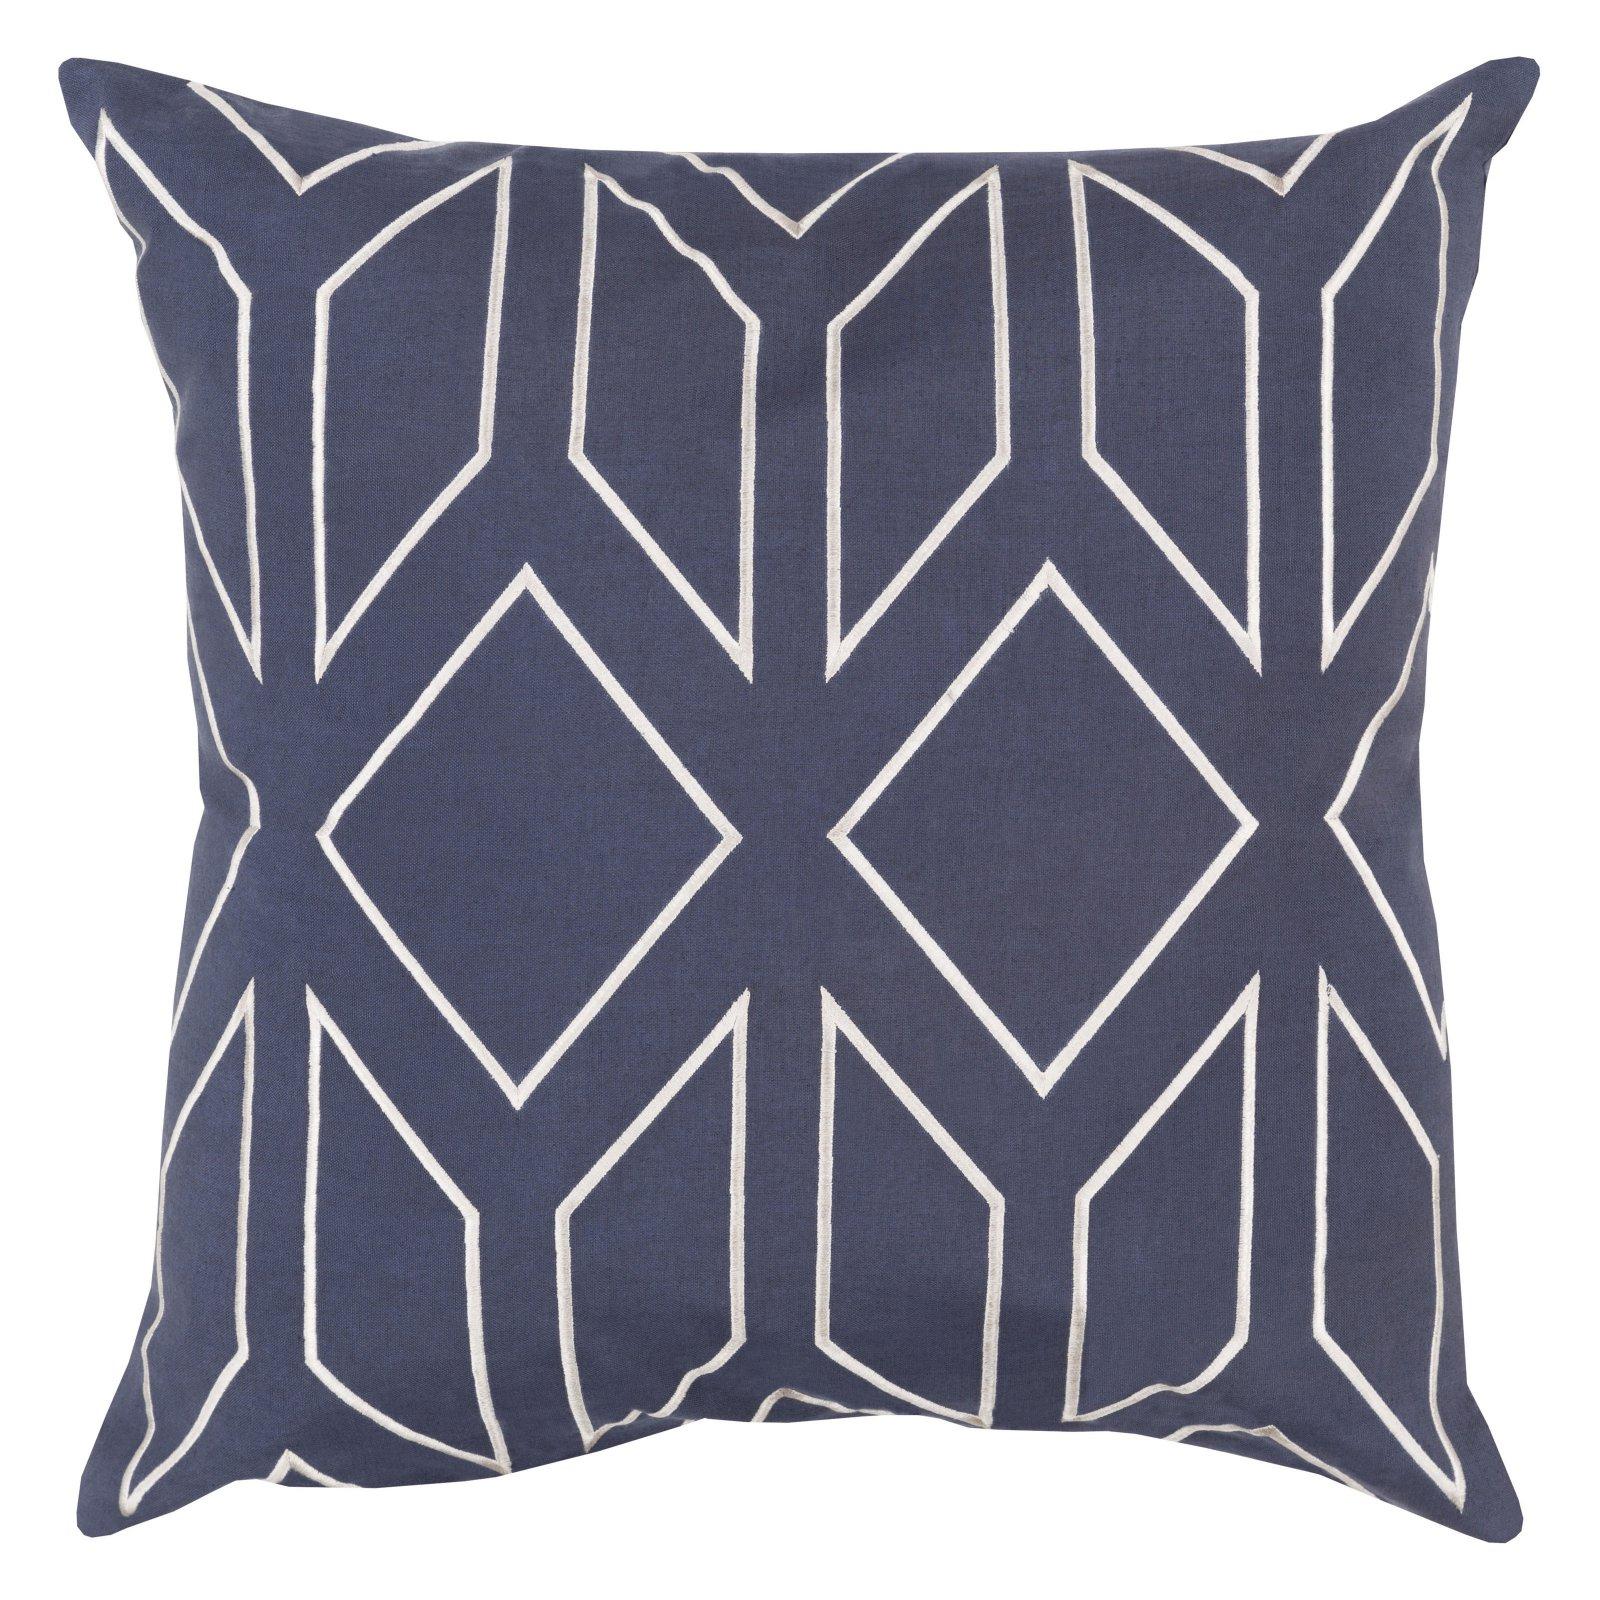 Surya Skyline IV Decorative Throw Pillow